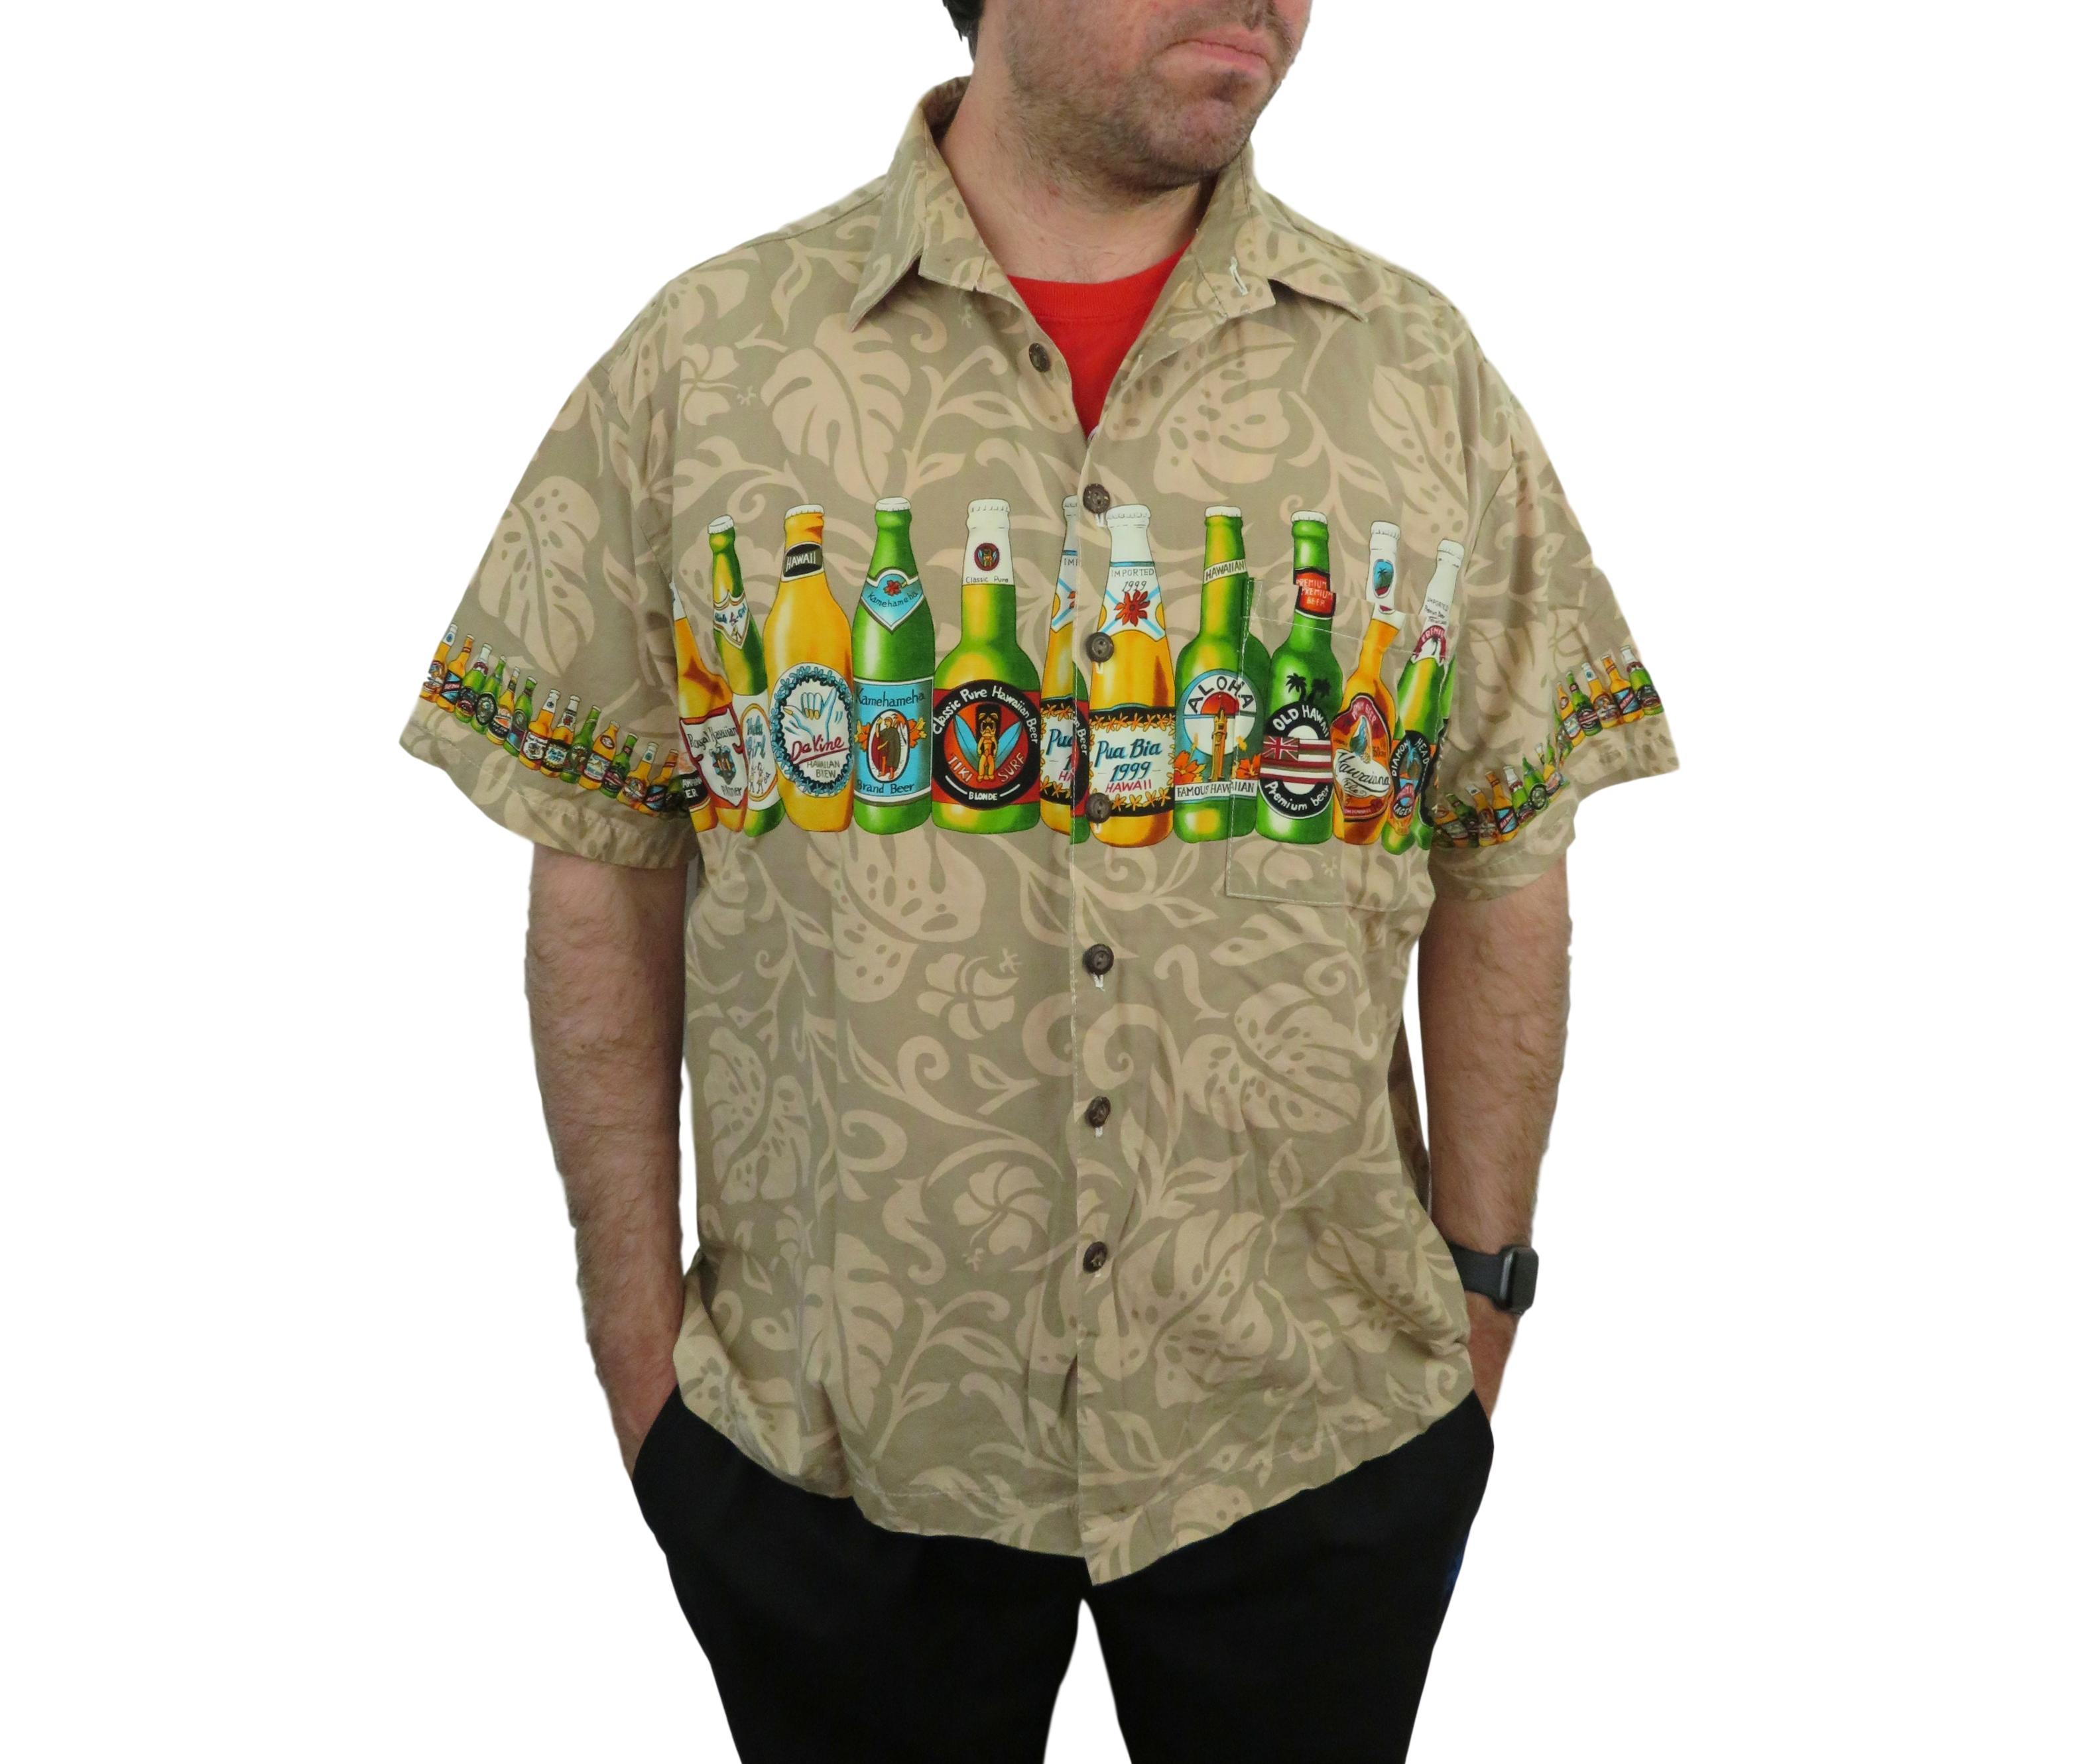 11c1b48b13f51 Vintage Koko Island Men's BEER HAWAIIAN SHIRT 2XL Floral Camp Aloha Tiki  XXL Short Sleeve Button Down Pua Bia Kamehameha Diamond Head Hotels